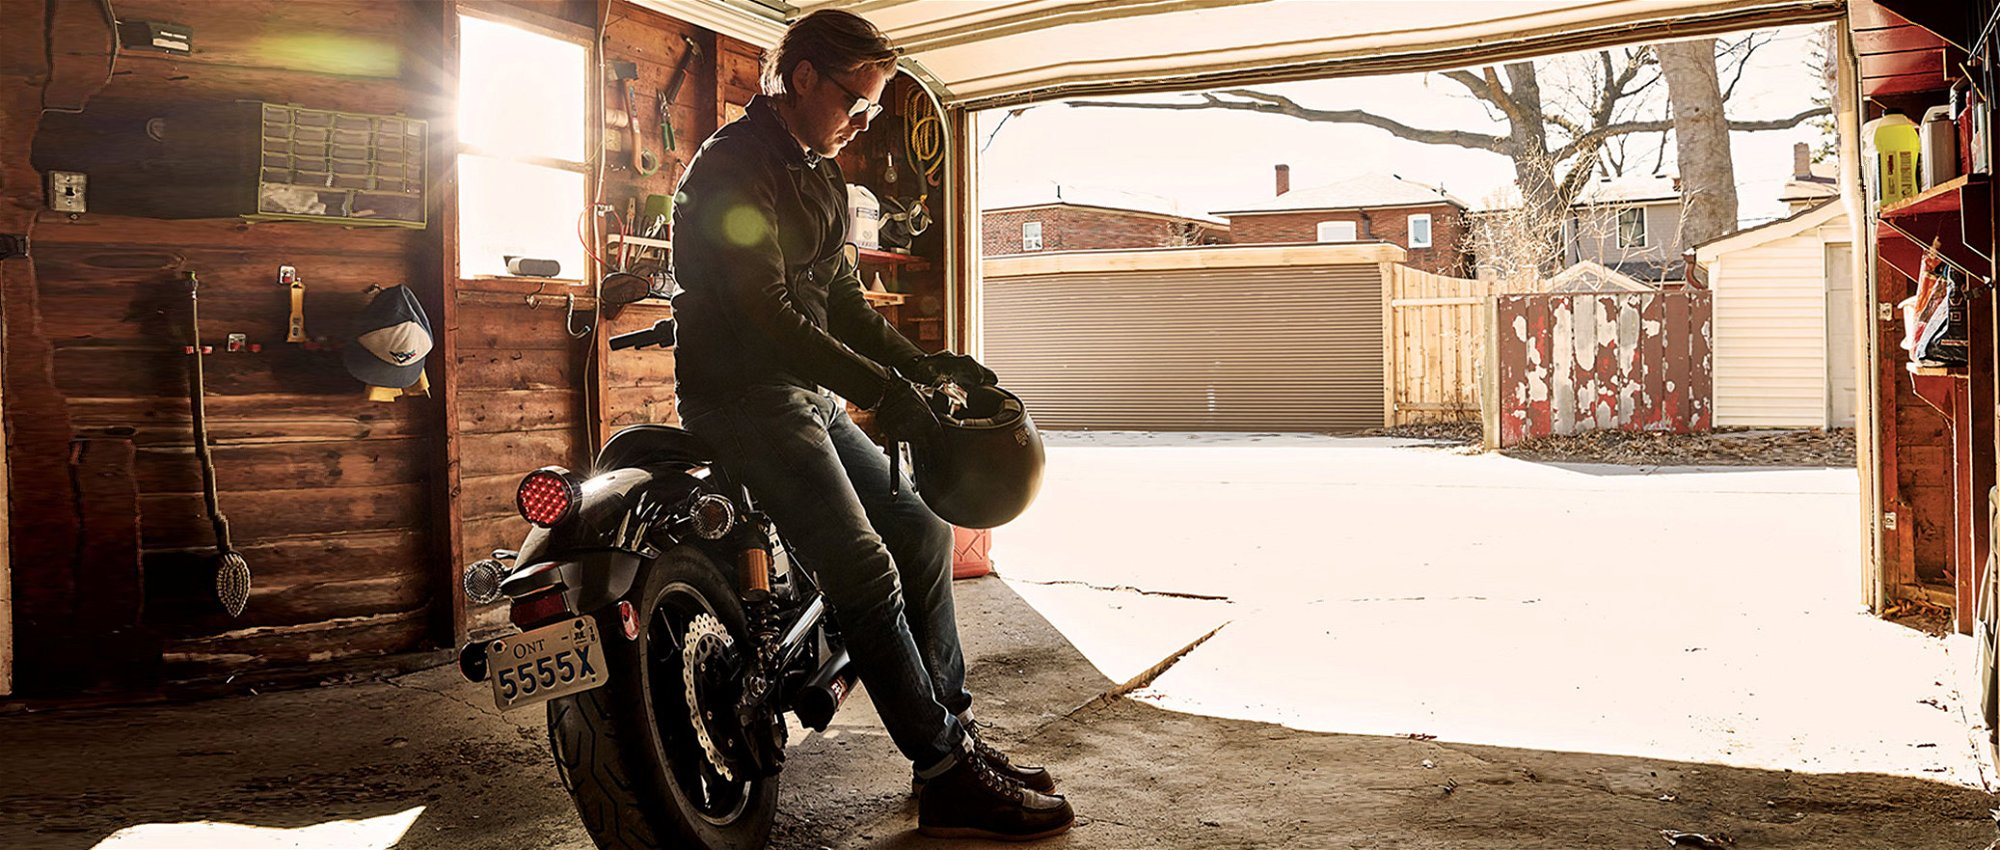 Denham Leather Double Rider Moto Jacket Garage Gregory Lalonde LALONDEs